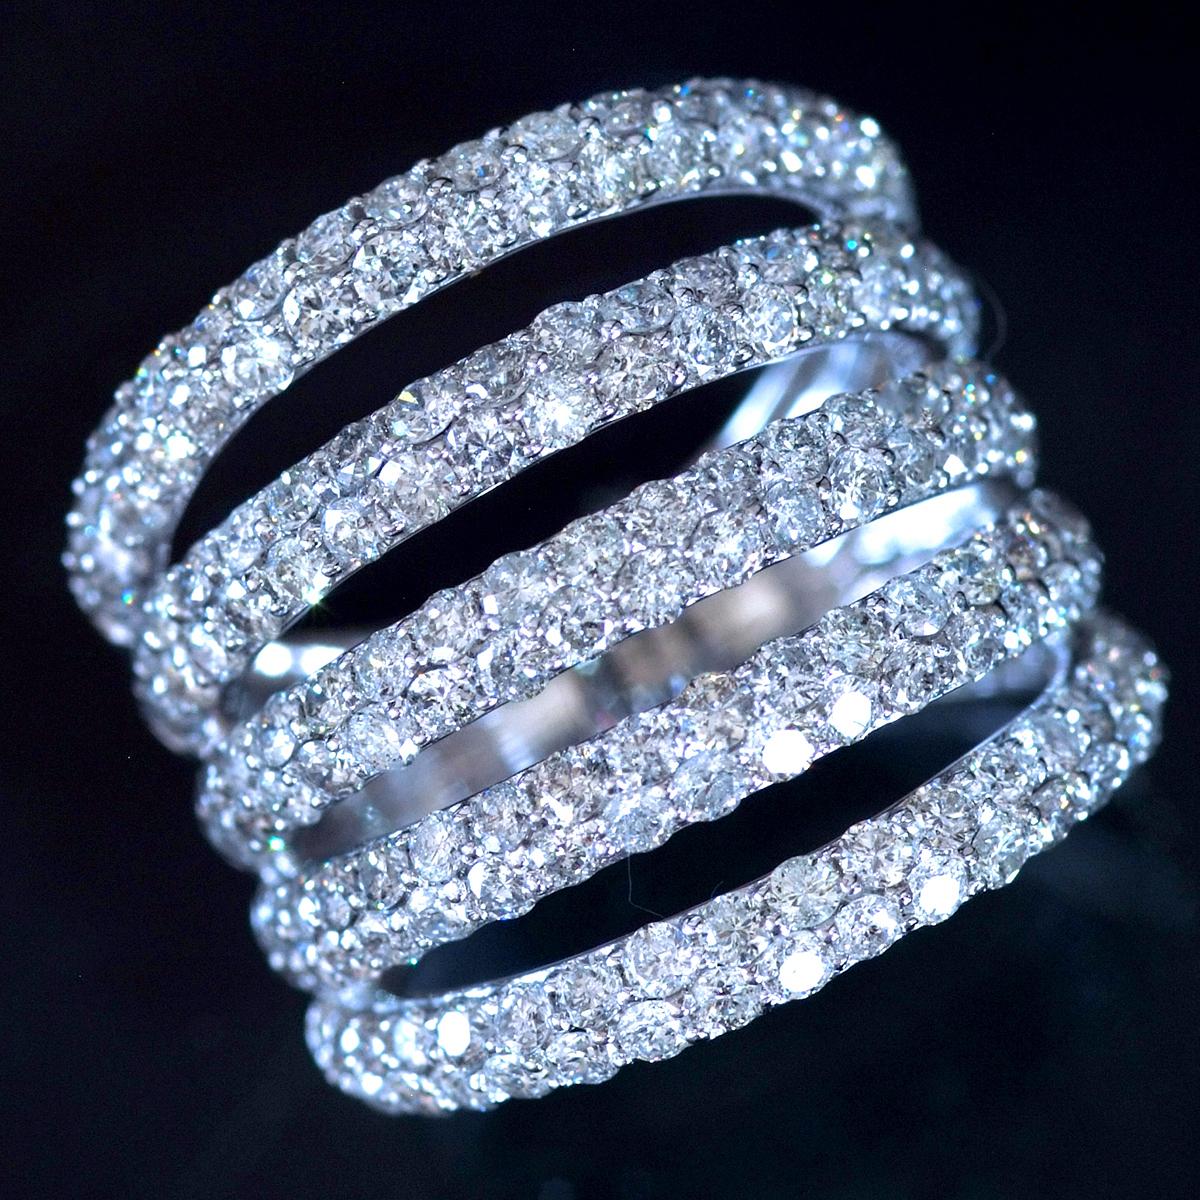 *R4747 令和新作モデル!美しい天然ダイヤモンド3.00ct 最高級18金WG無垢セレブリティビックリング サイズ12號 重量8g 縦幅19.8mm